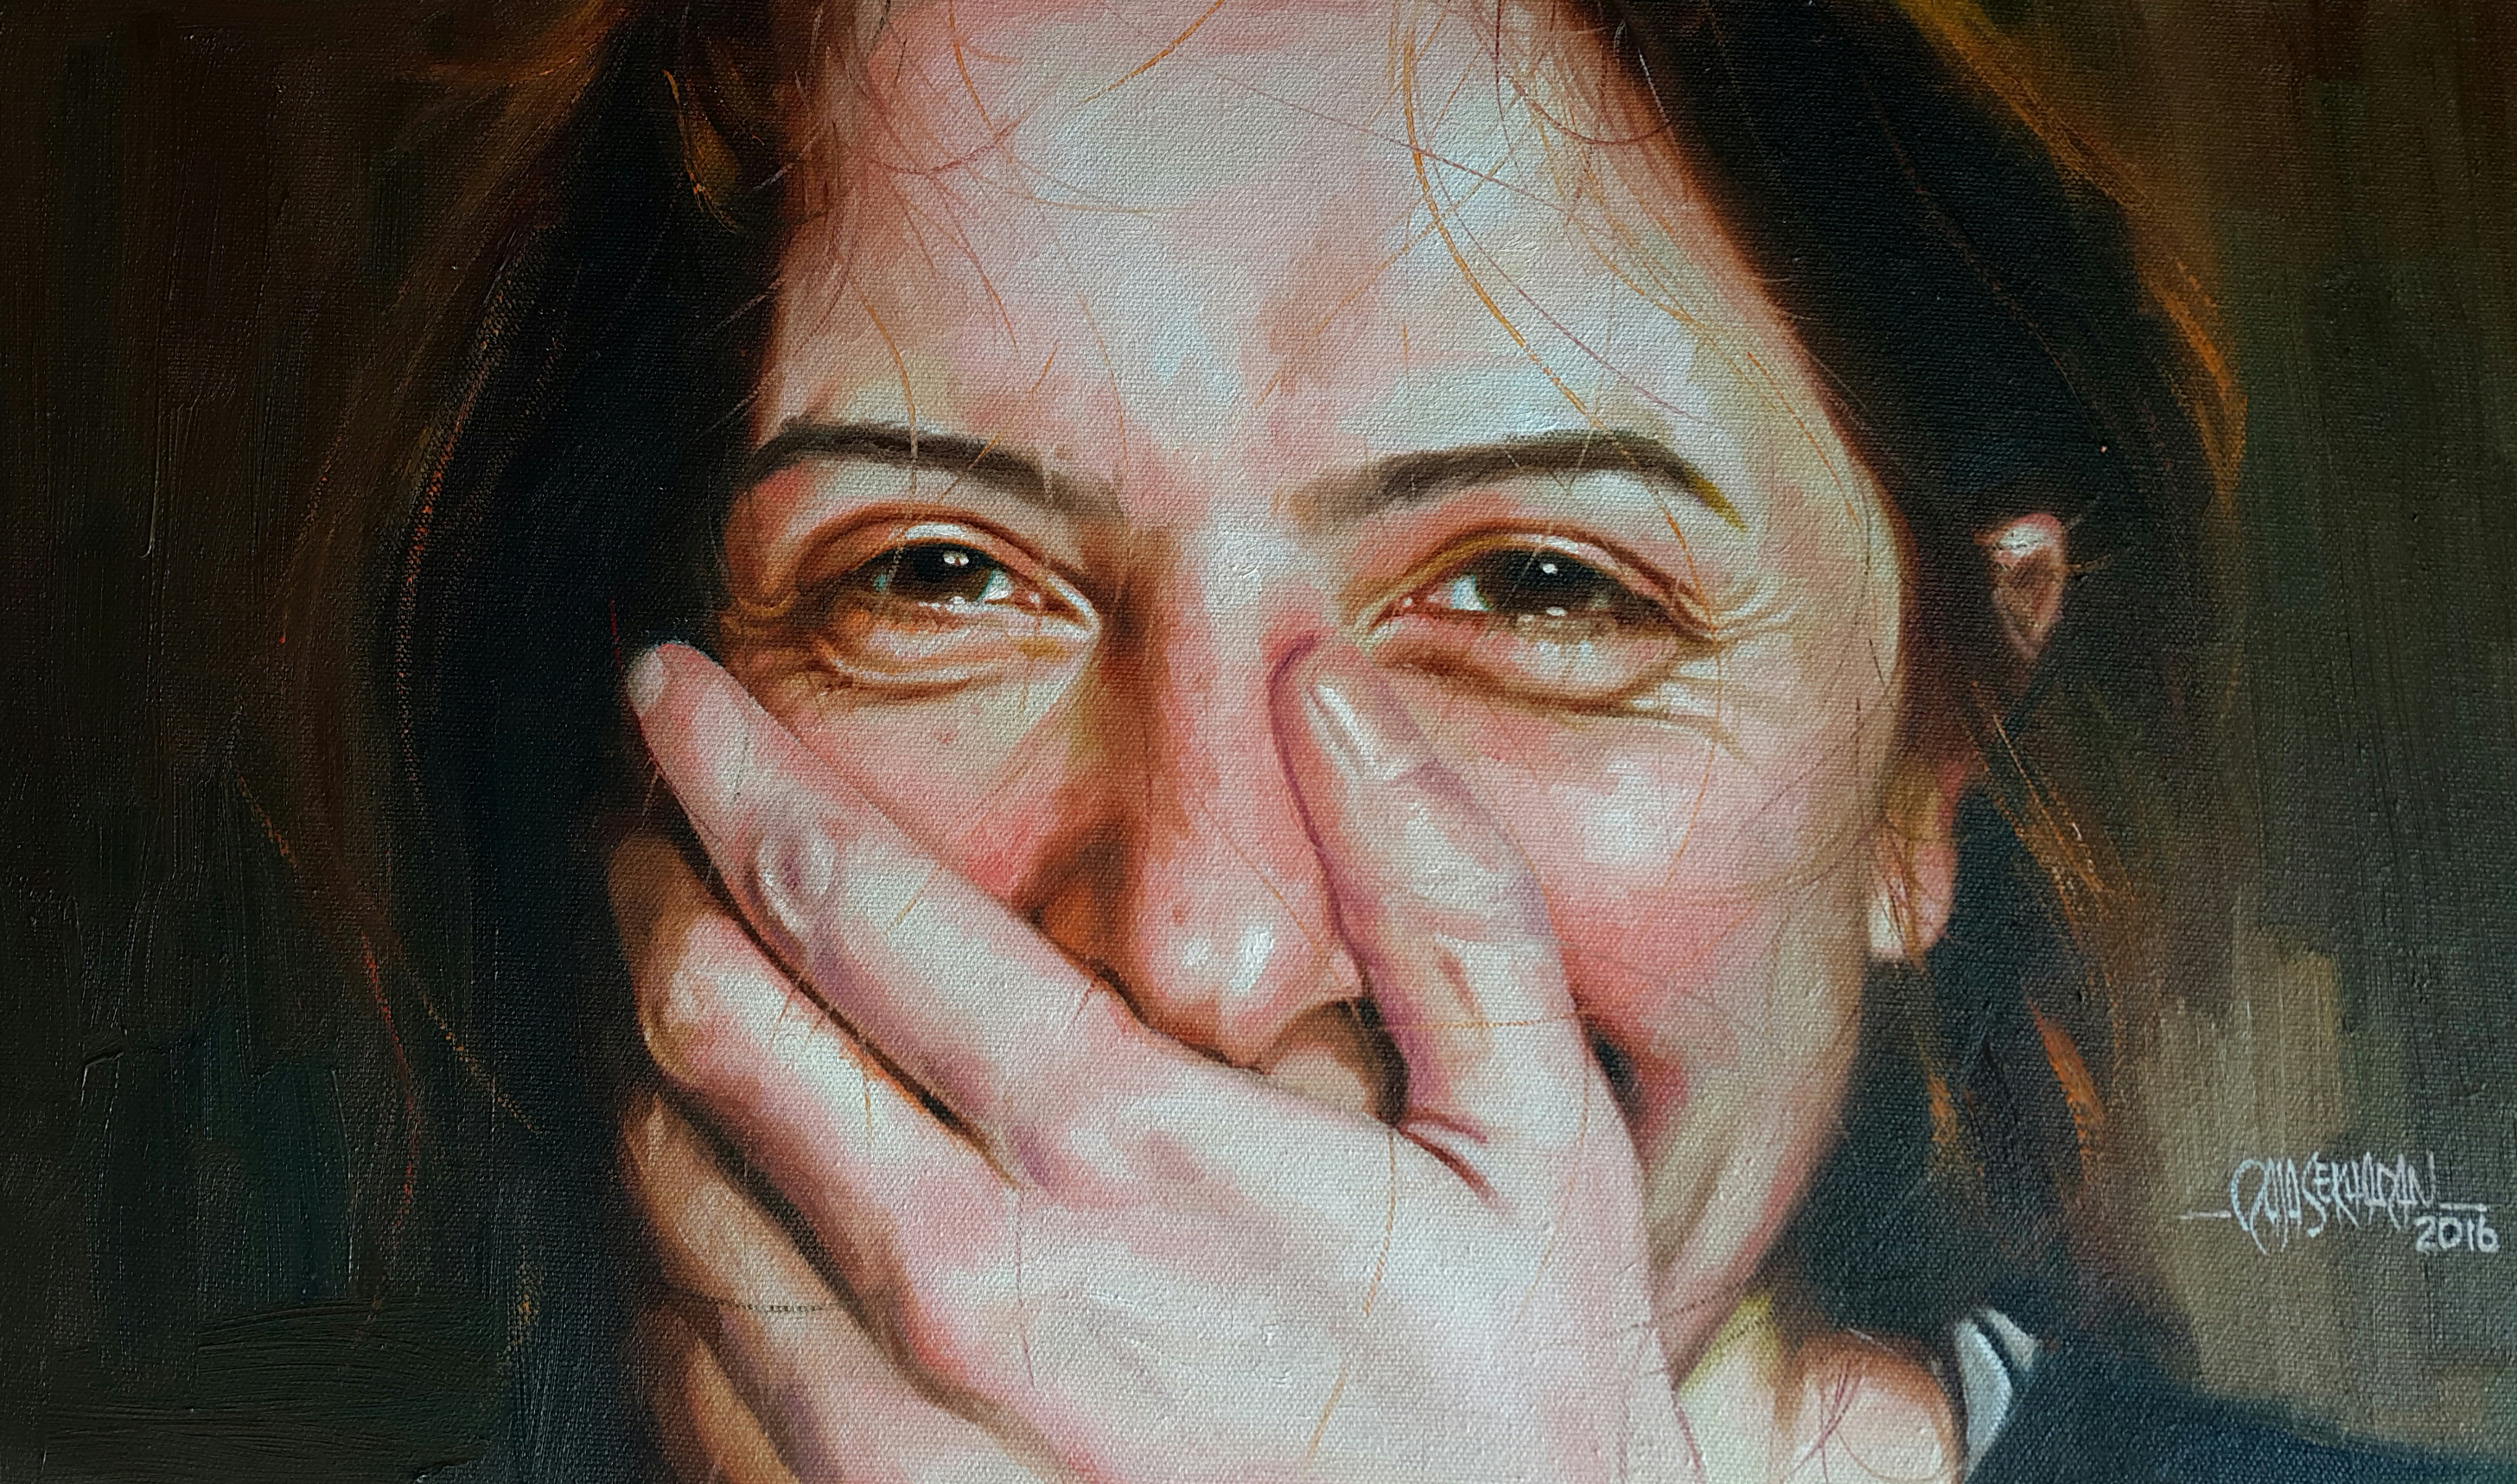 smile painting ile ilgili görsel sonucu